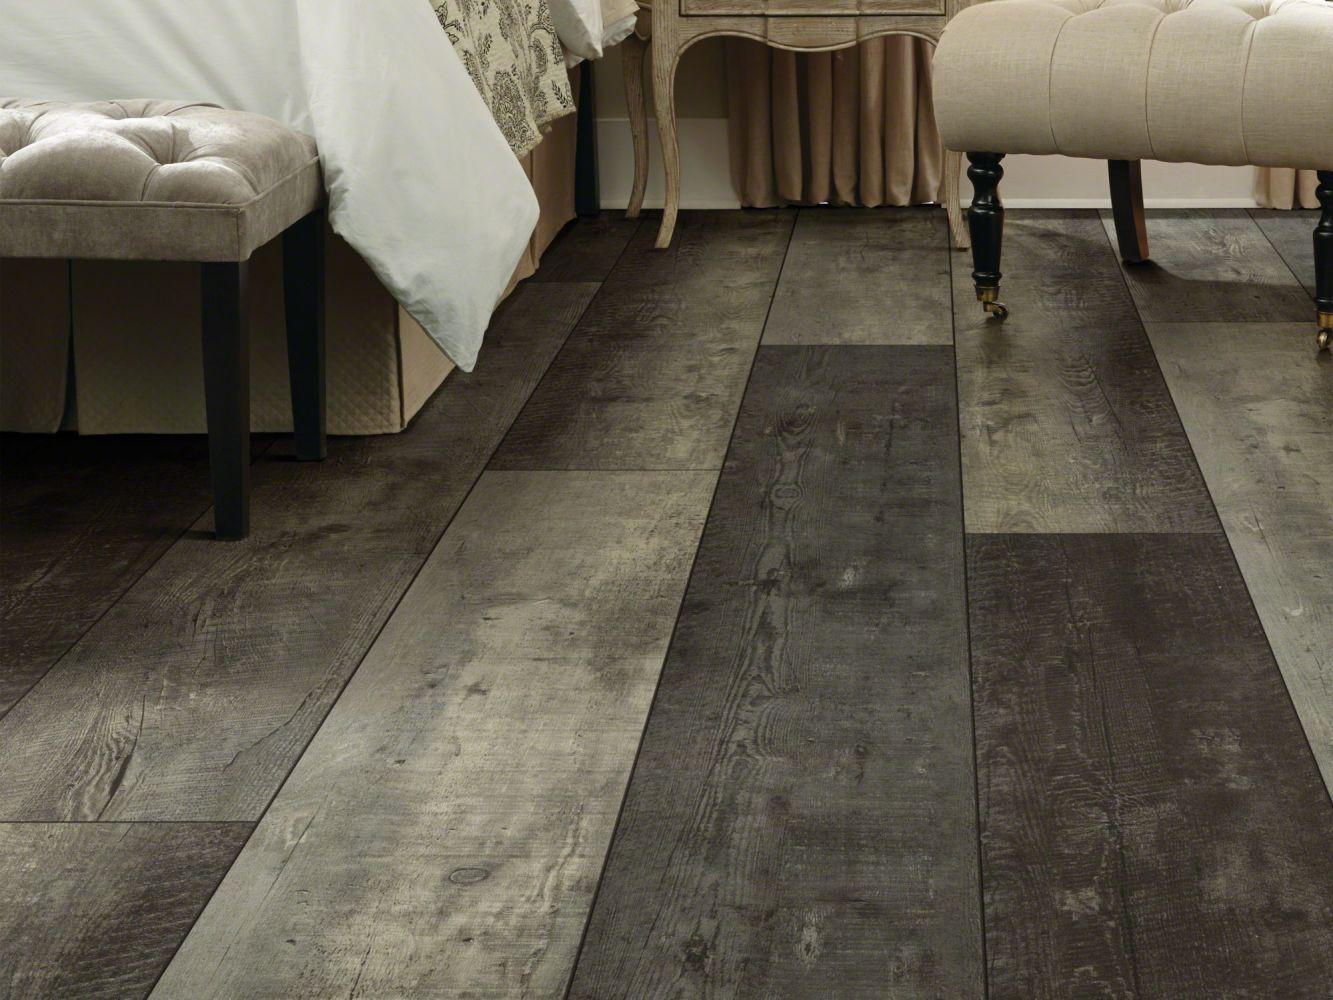 Shaw Floors Vinyl Residential Titan HD Plus Arcadia Barnboard 05051_2002V